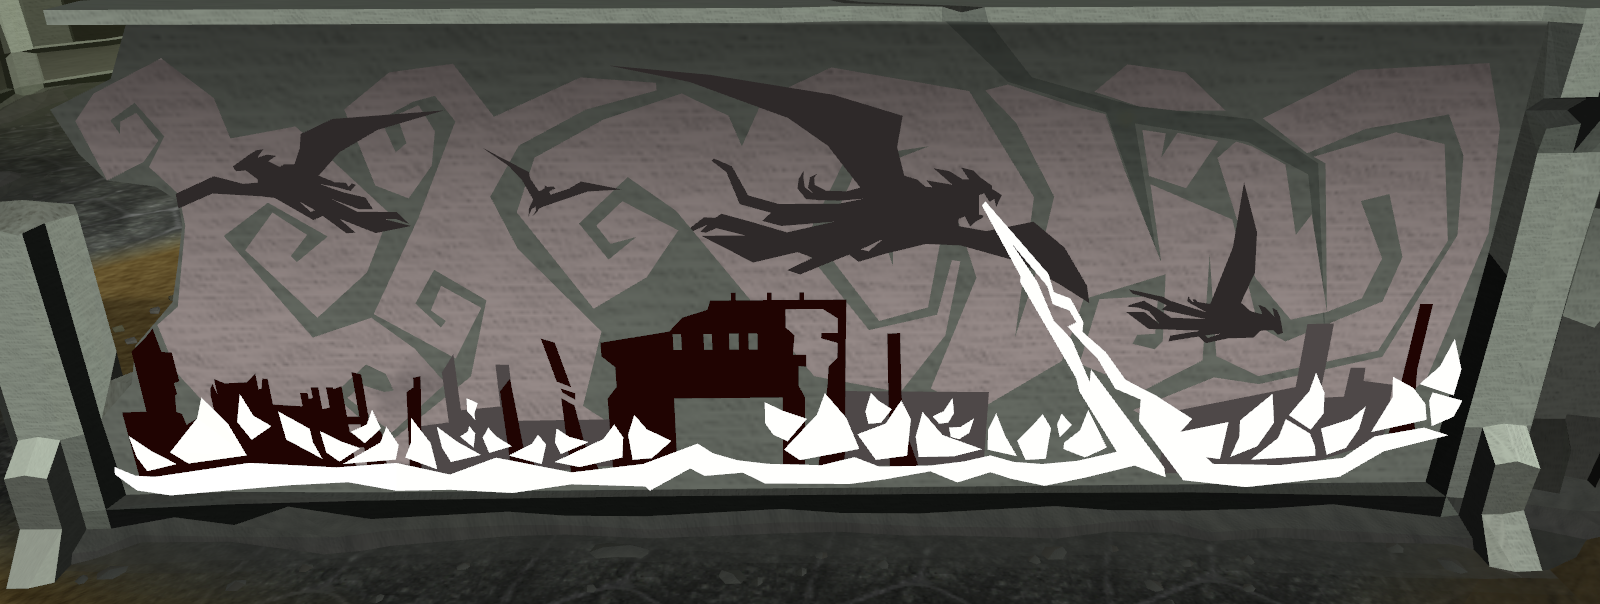 Kethsi runescape wiki wikia for Fallout 4 mural